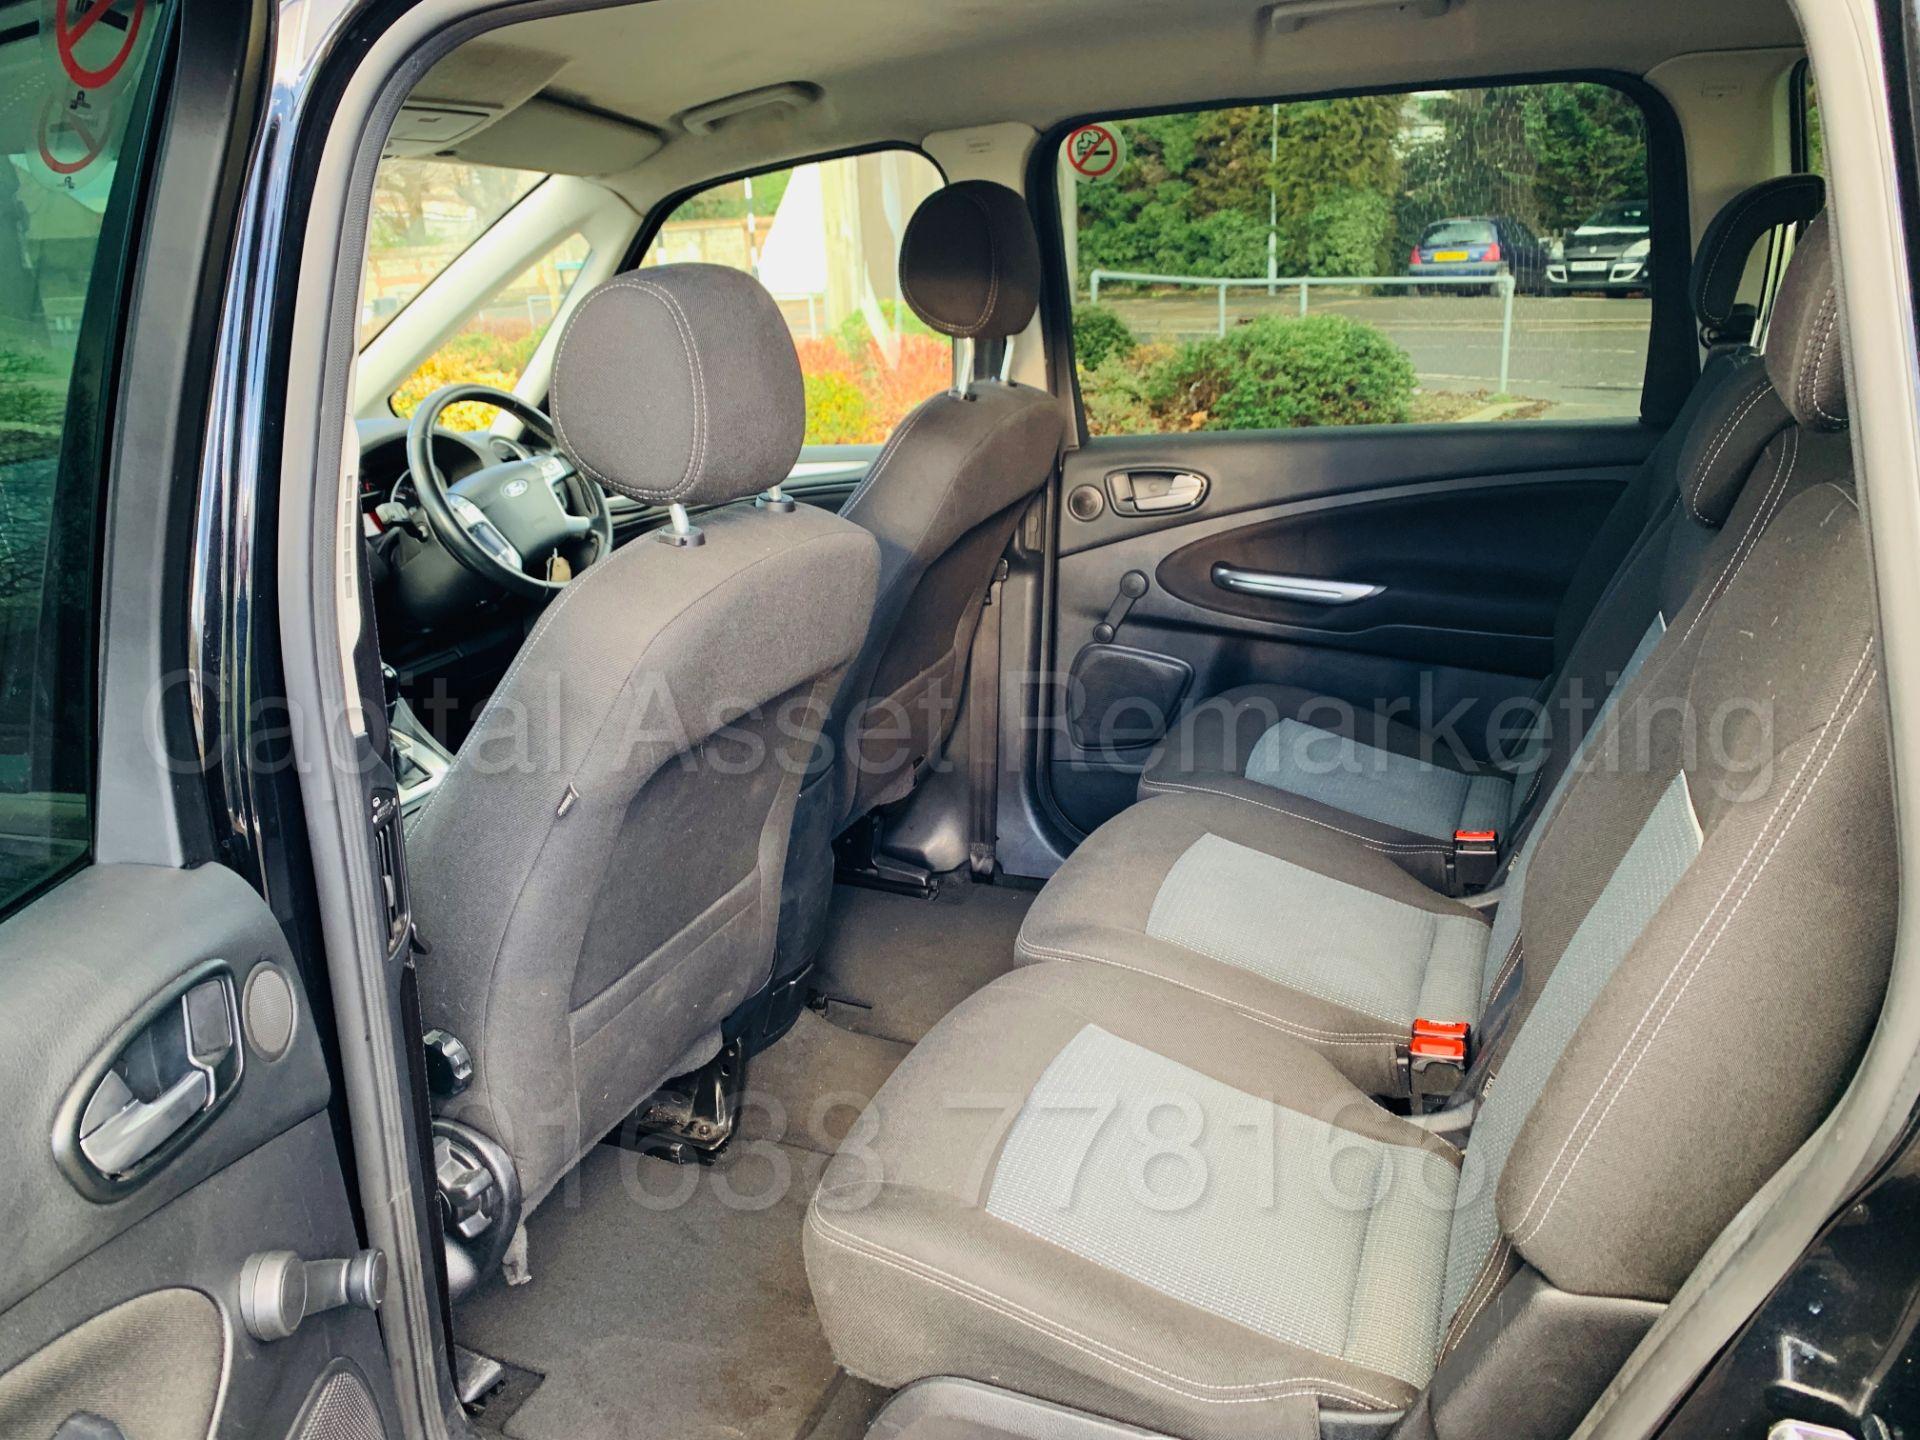 Lot 10 - FORD GALAXY **ZETEC** 7 SEATER MPV (2015 MODEL) 2.0 TDCI - 140 BHP - AUTO POWER SHIFT (1 OWNER)